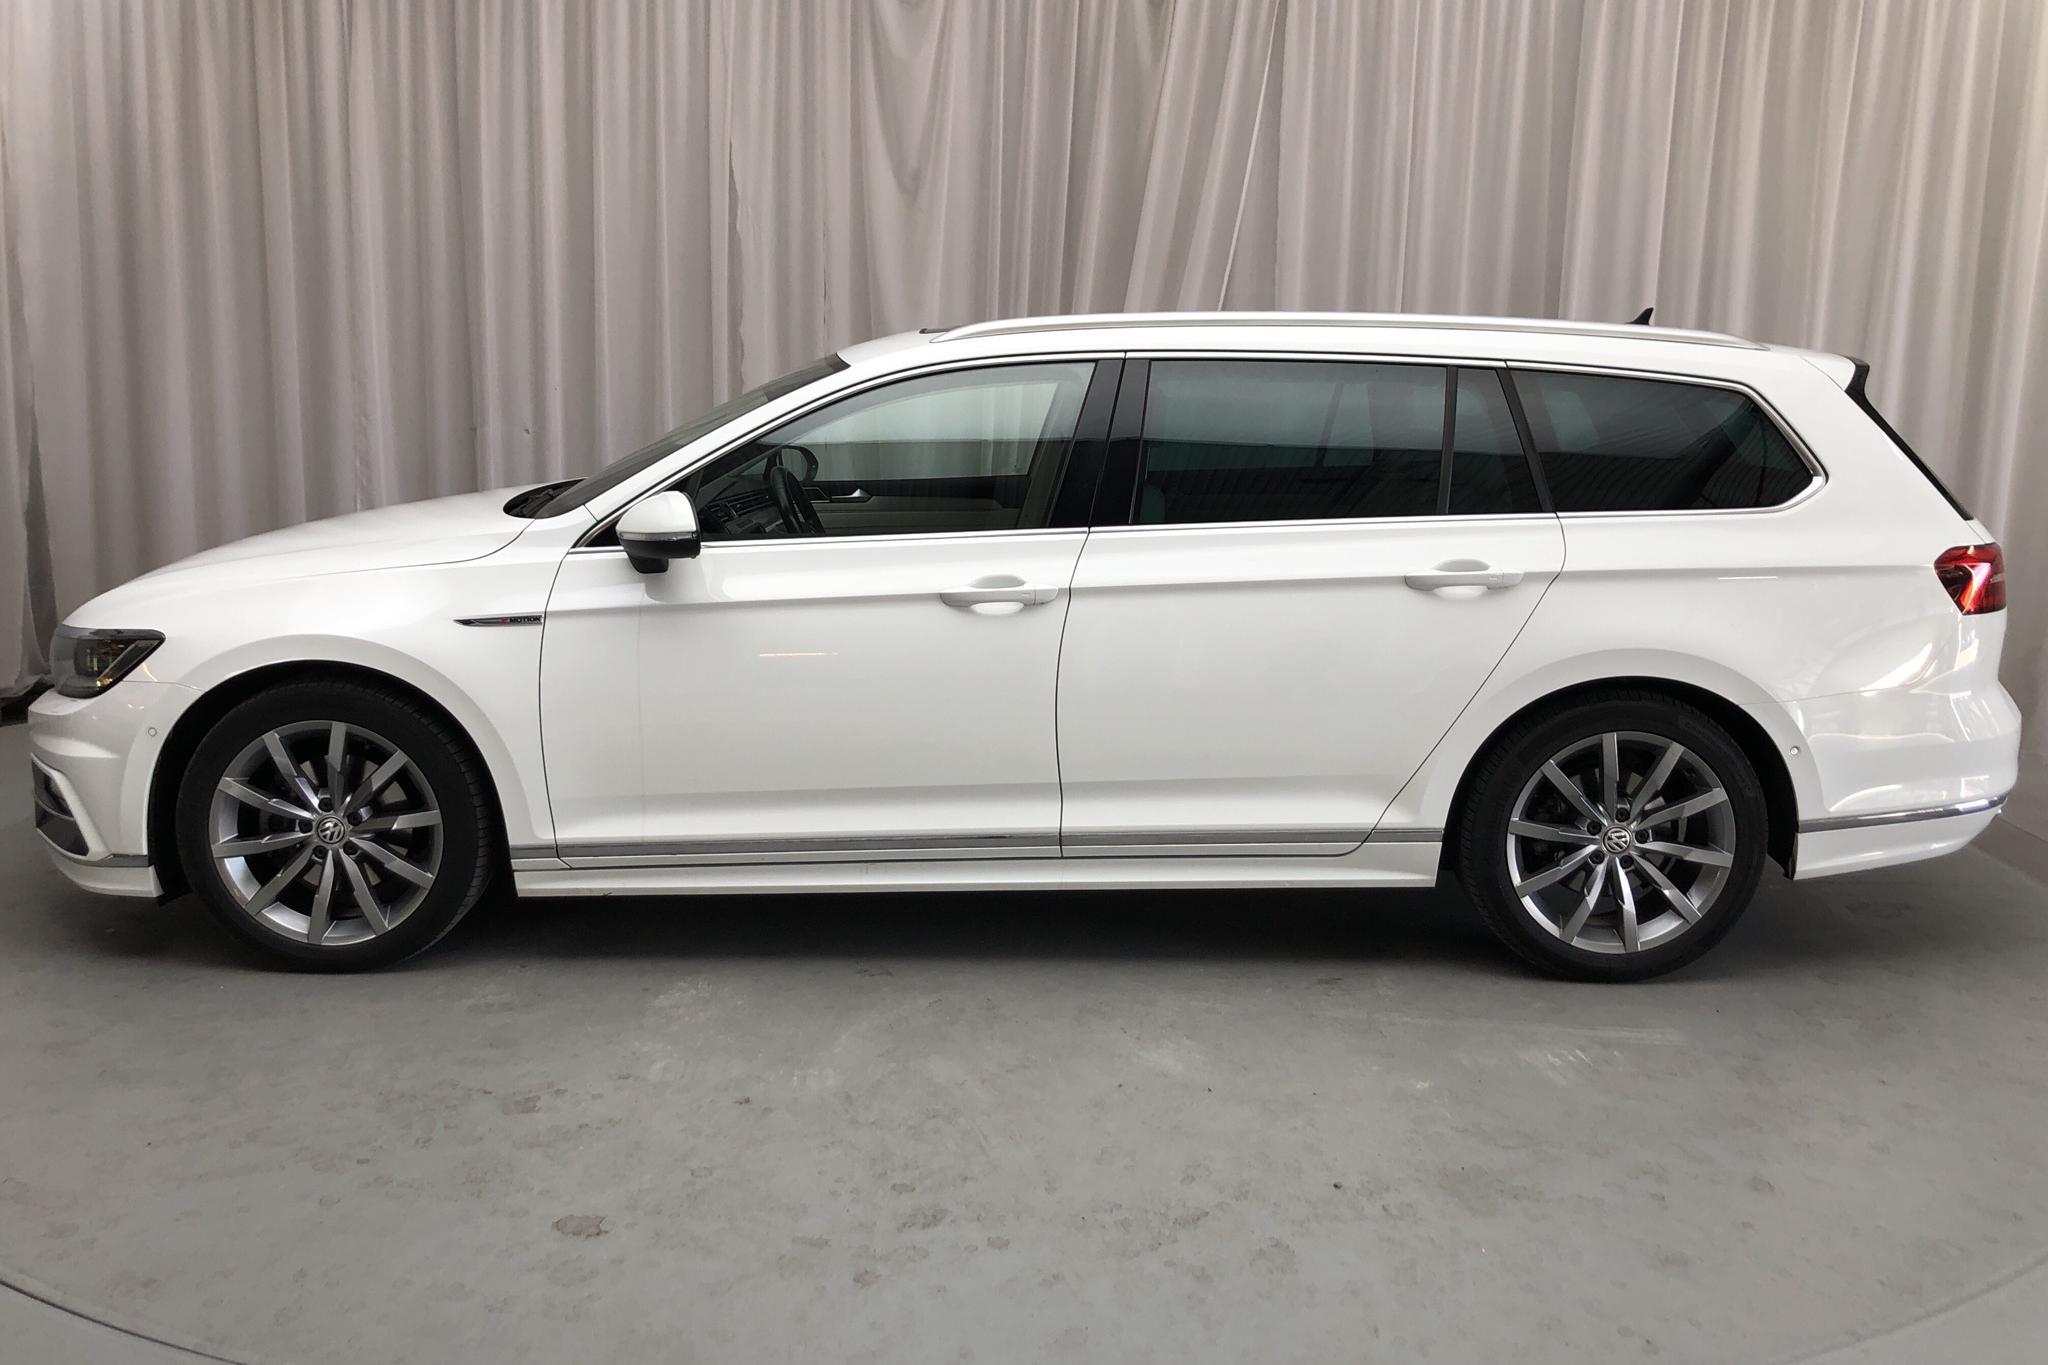 VW Passat 2.0 TDI Sportscombi 4MOTION (190hk) - 106 280 km - Automatic - white - 2018